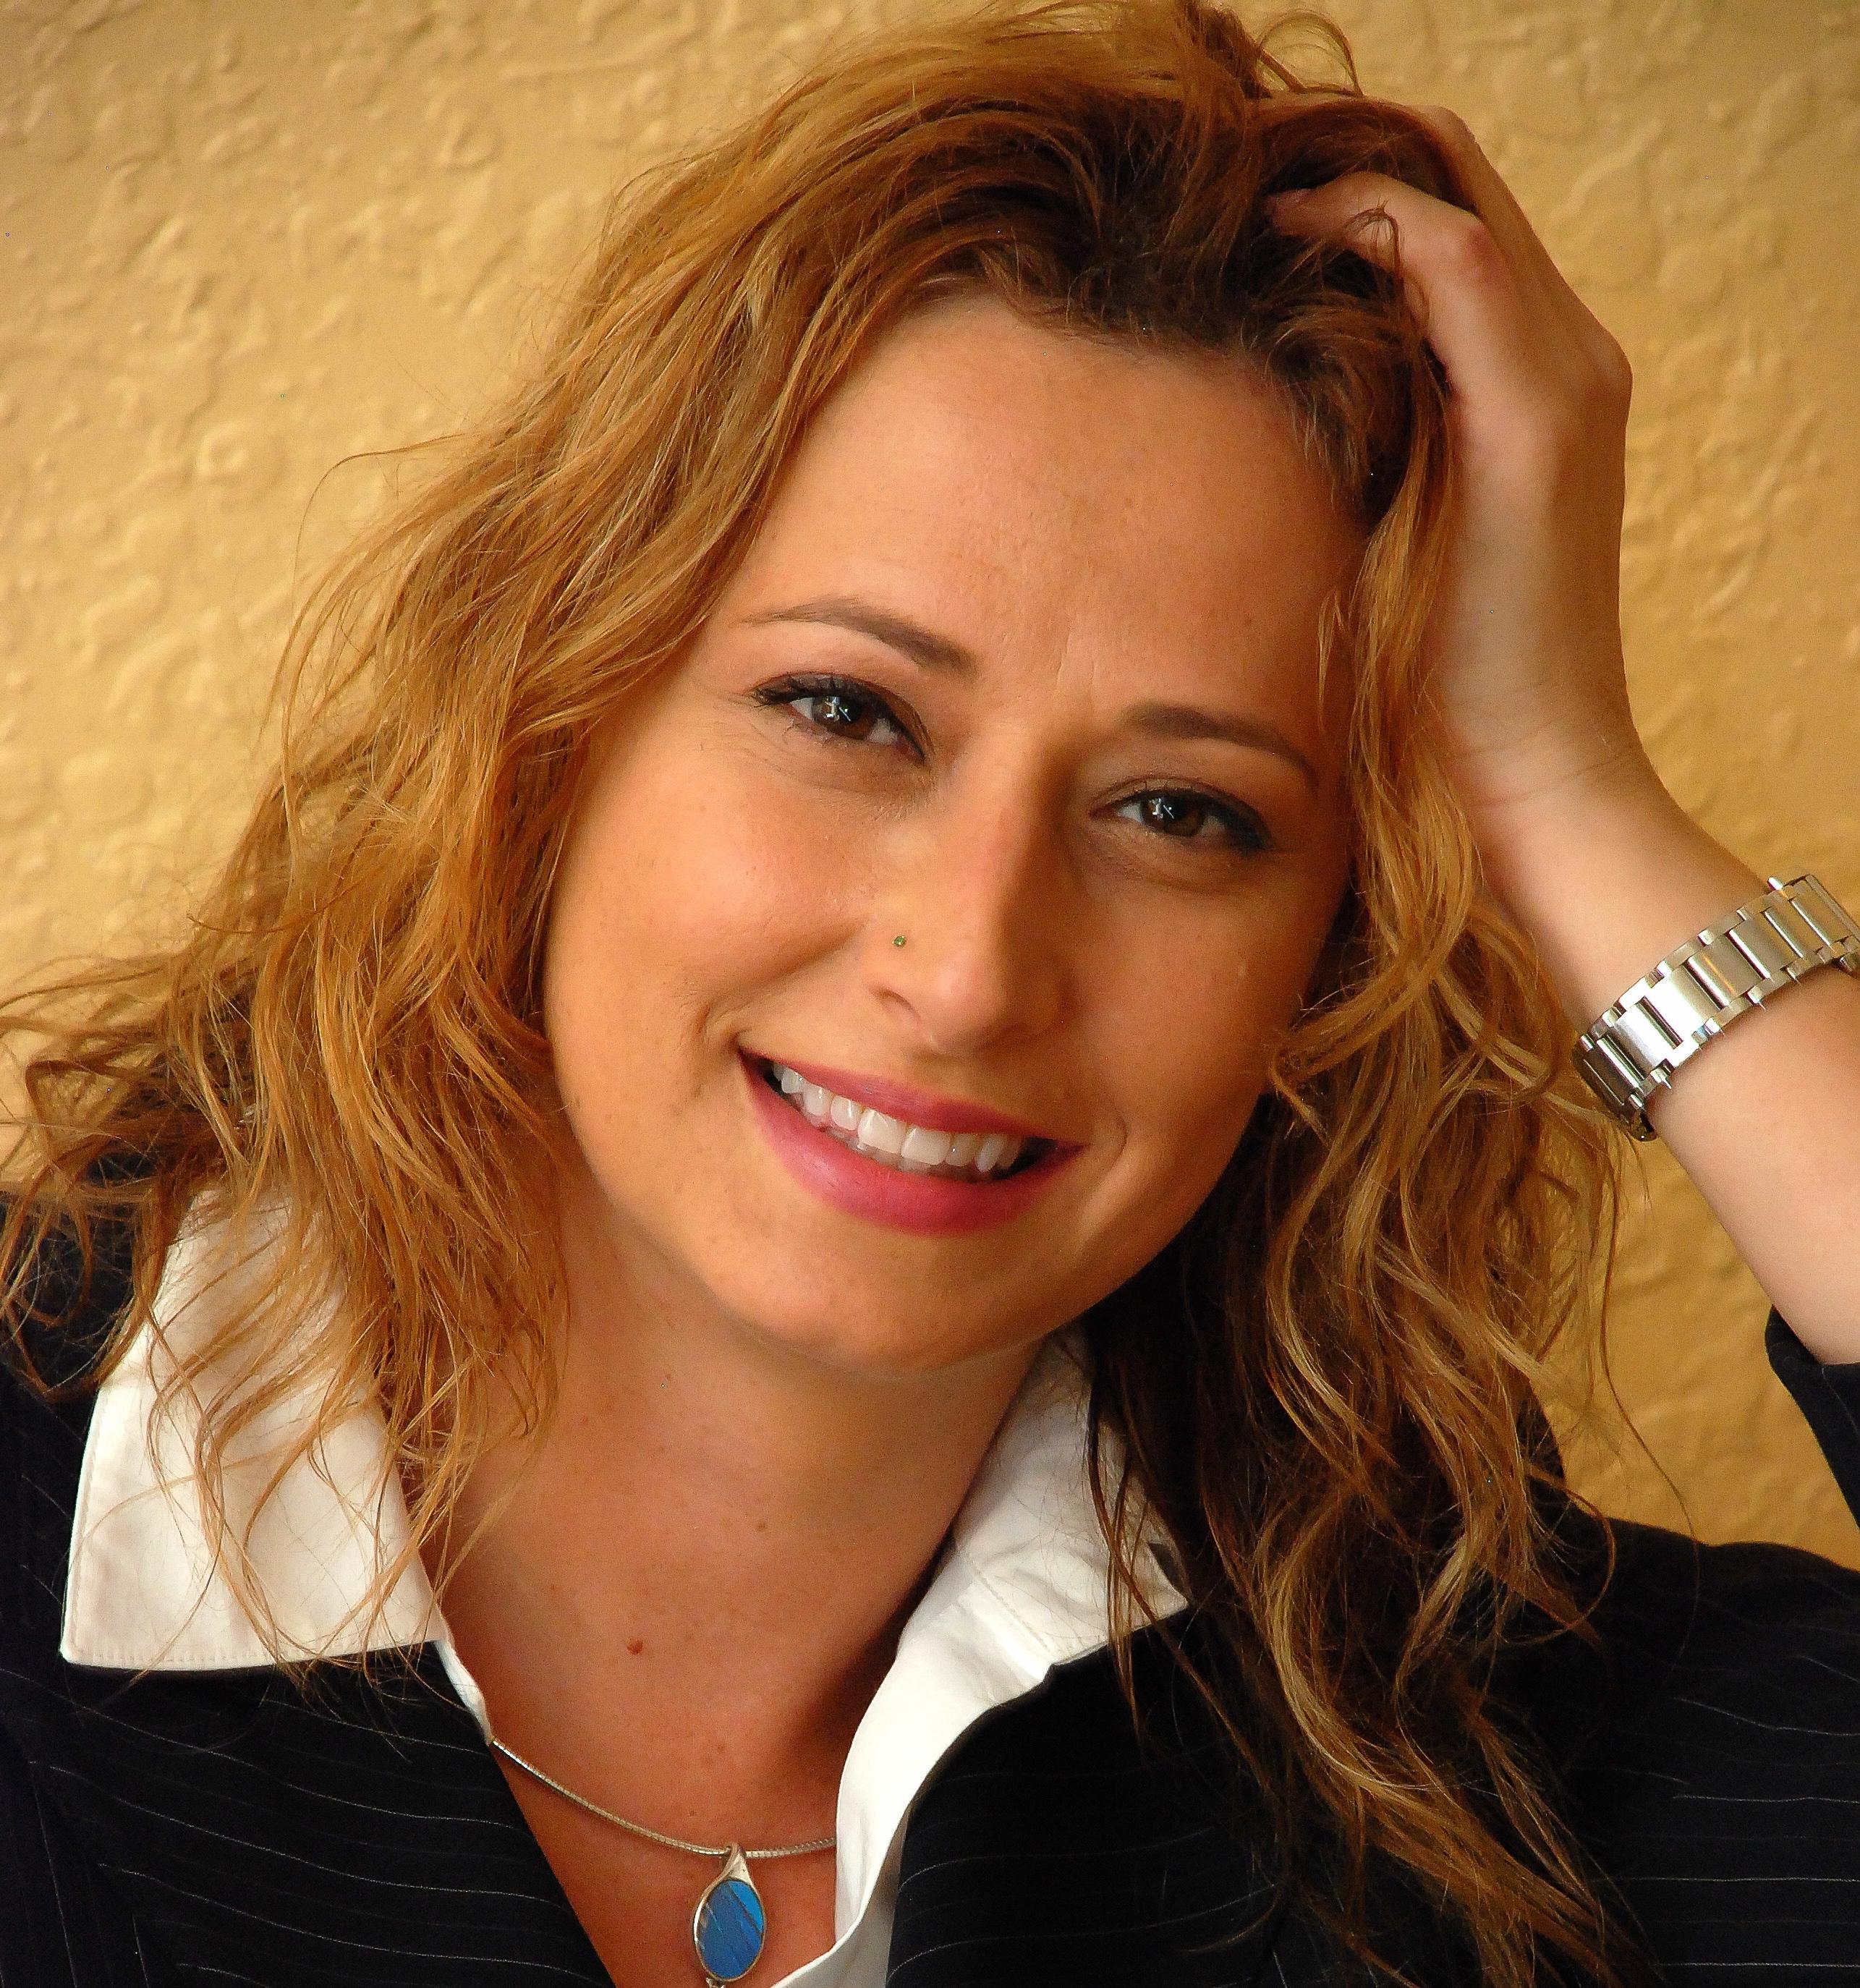 Nina Segura